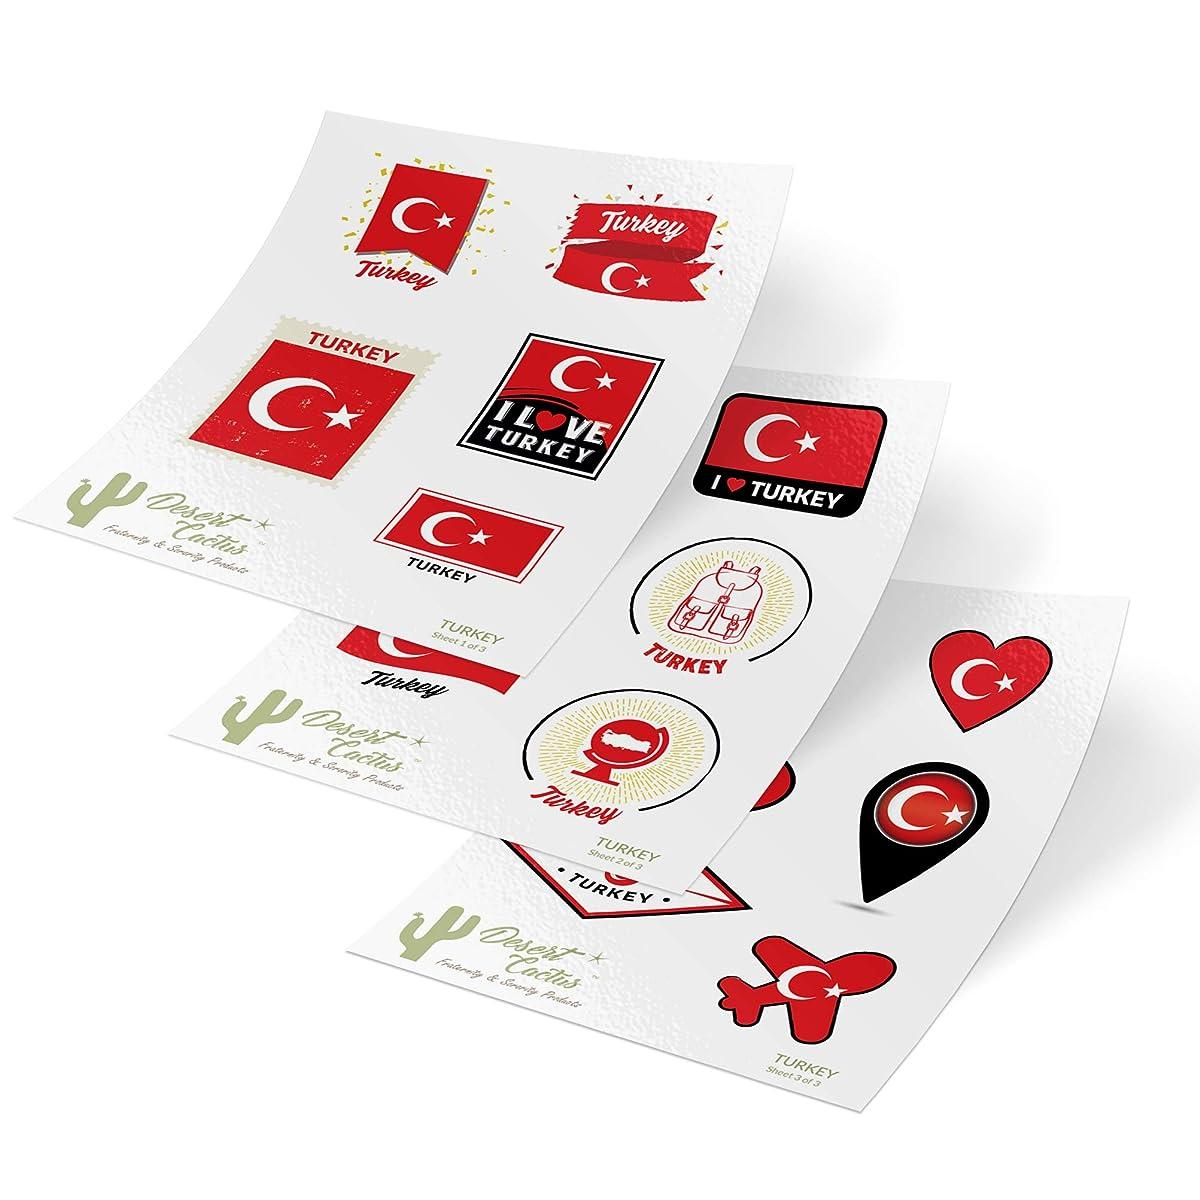 Turkey Country Flag Stickers Decals 3 Sheets 17 Total Pieces Kids Logo Scrapbook Car Vinyl Window Bumper Laptop 3 Sheets